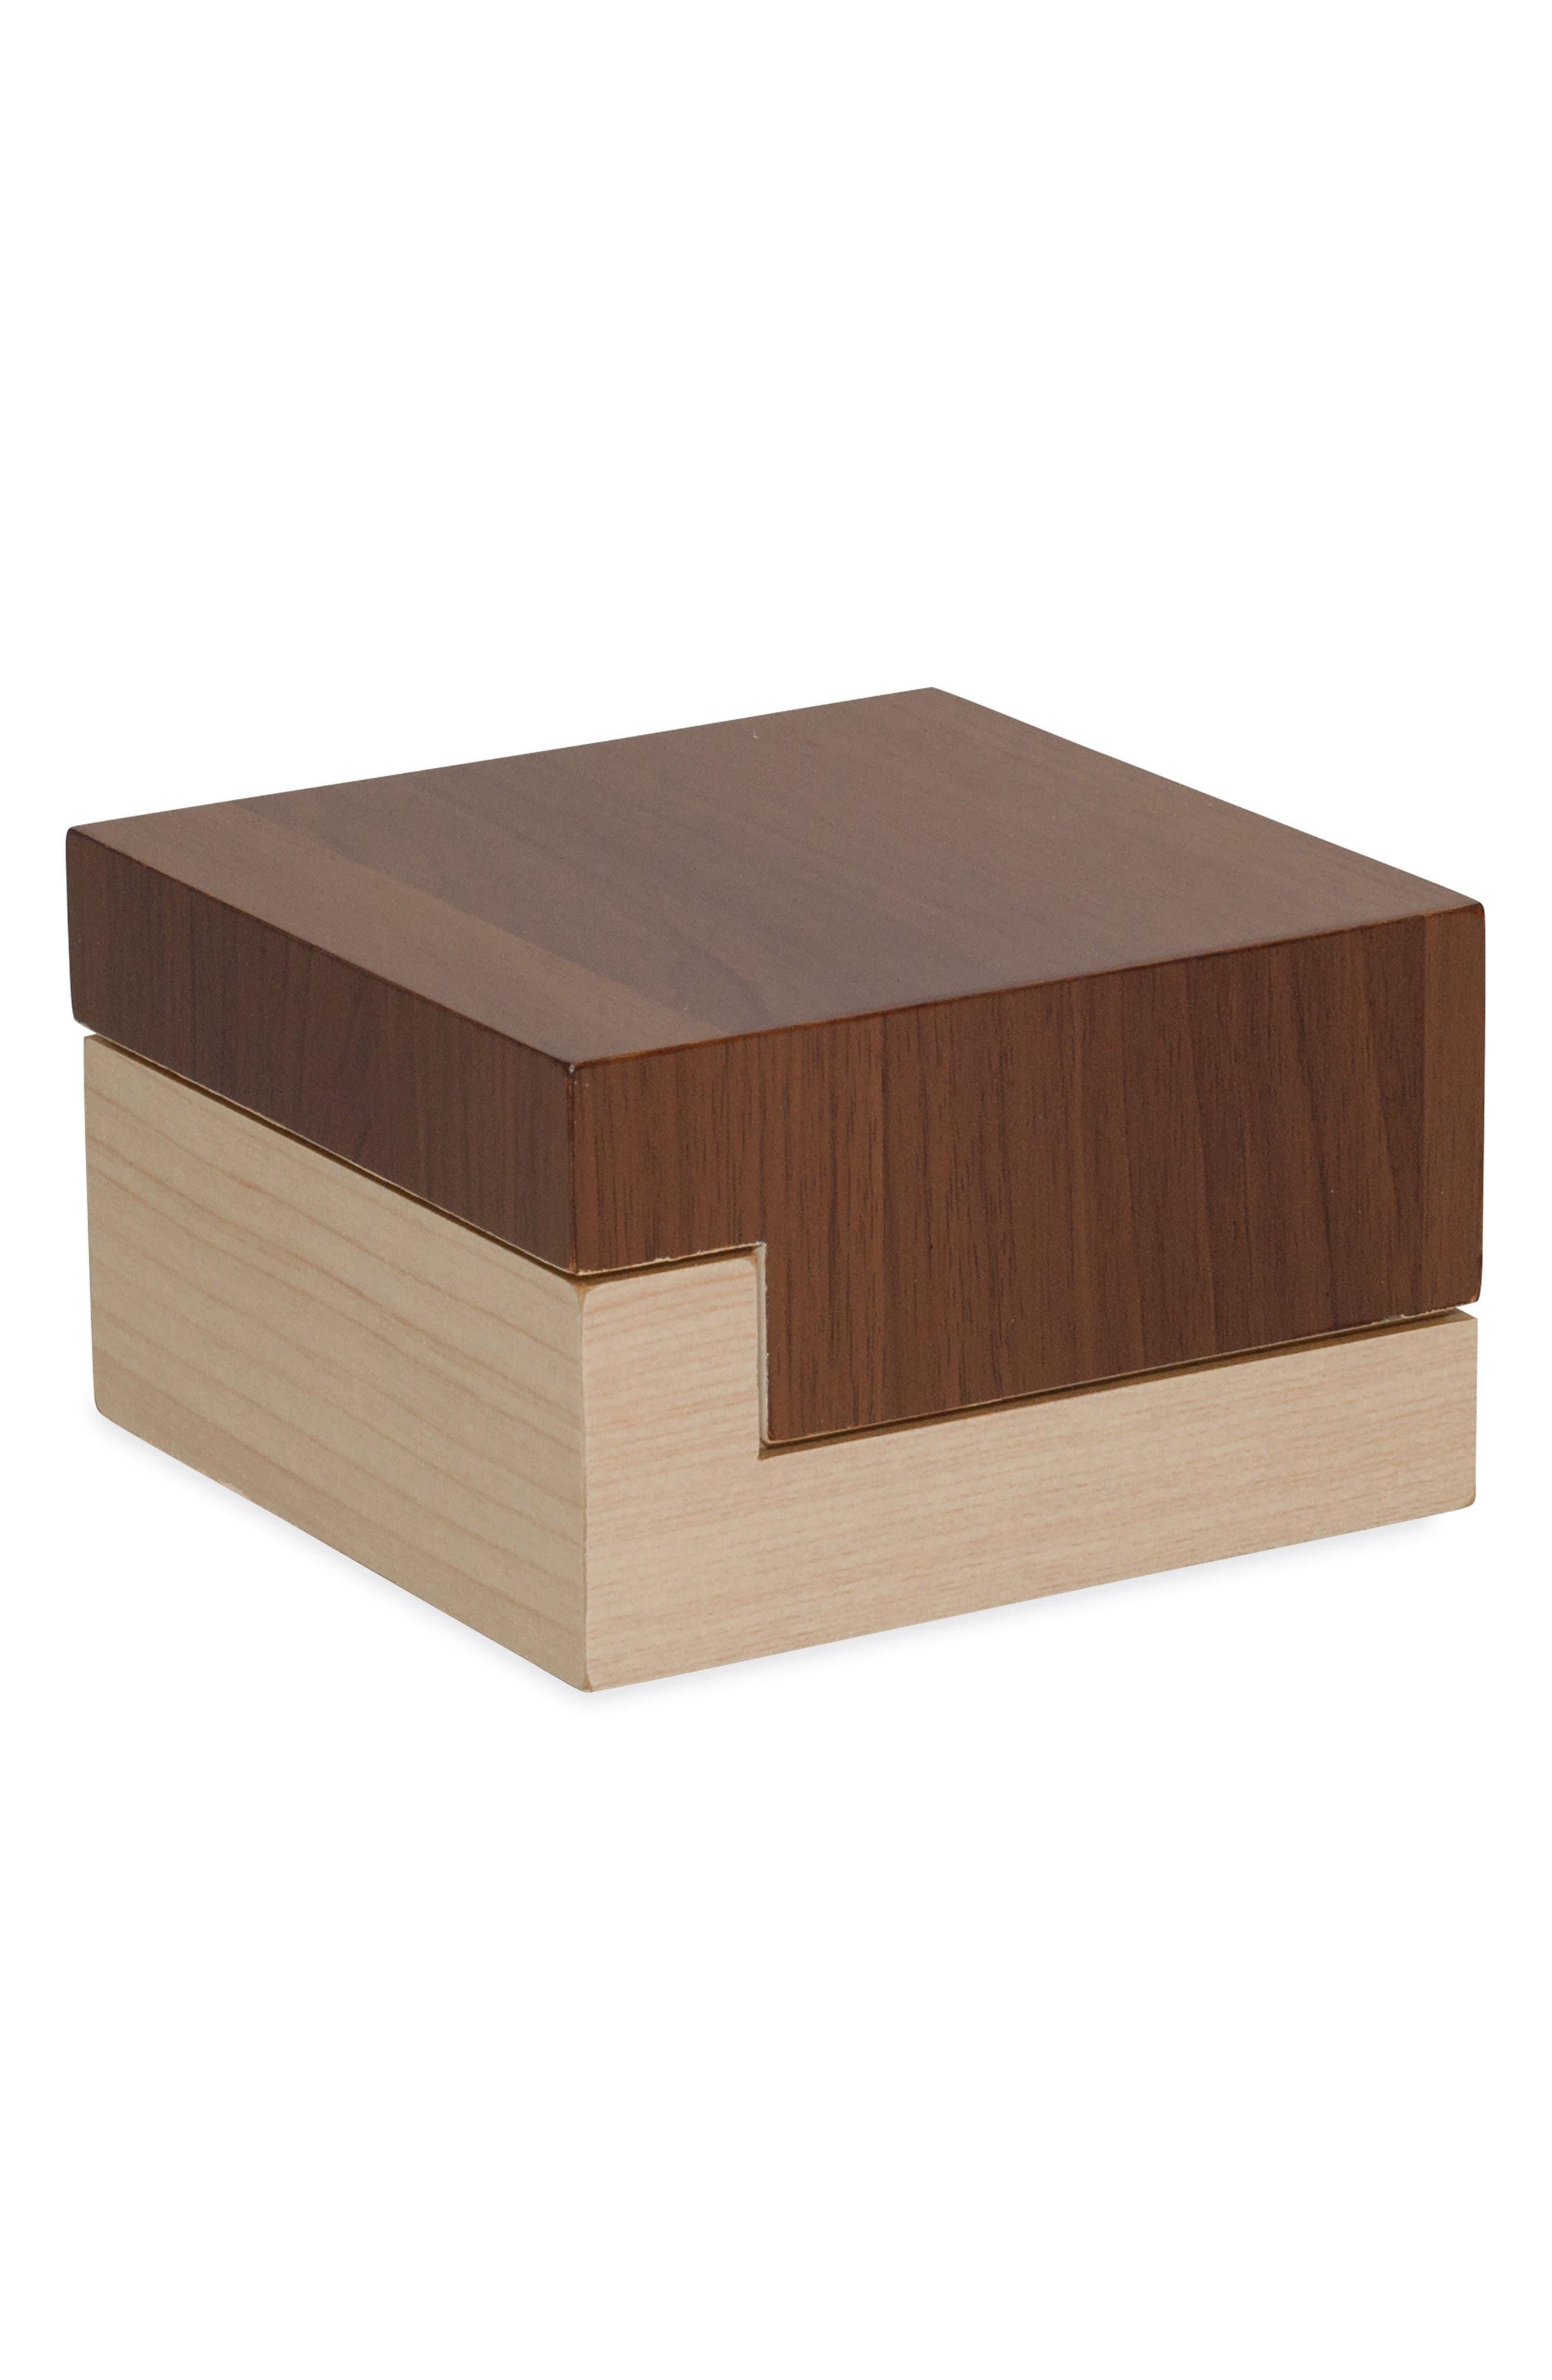 Alternate Image 1 Selected - DKNY Wood Block Covered Jar